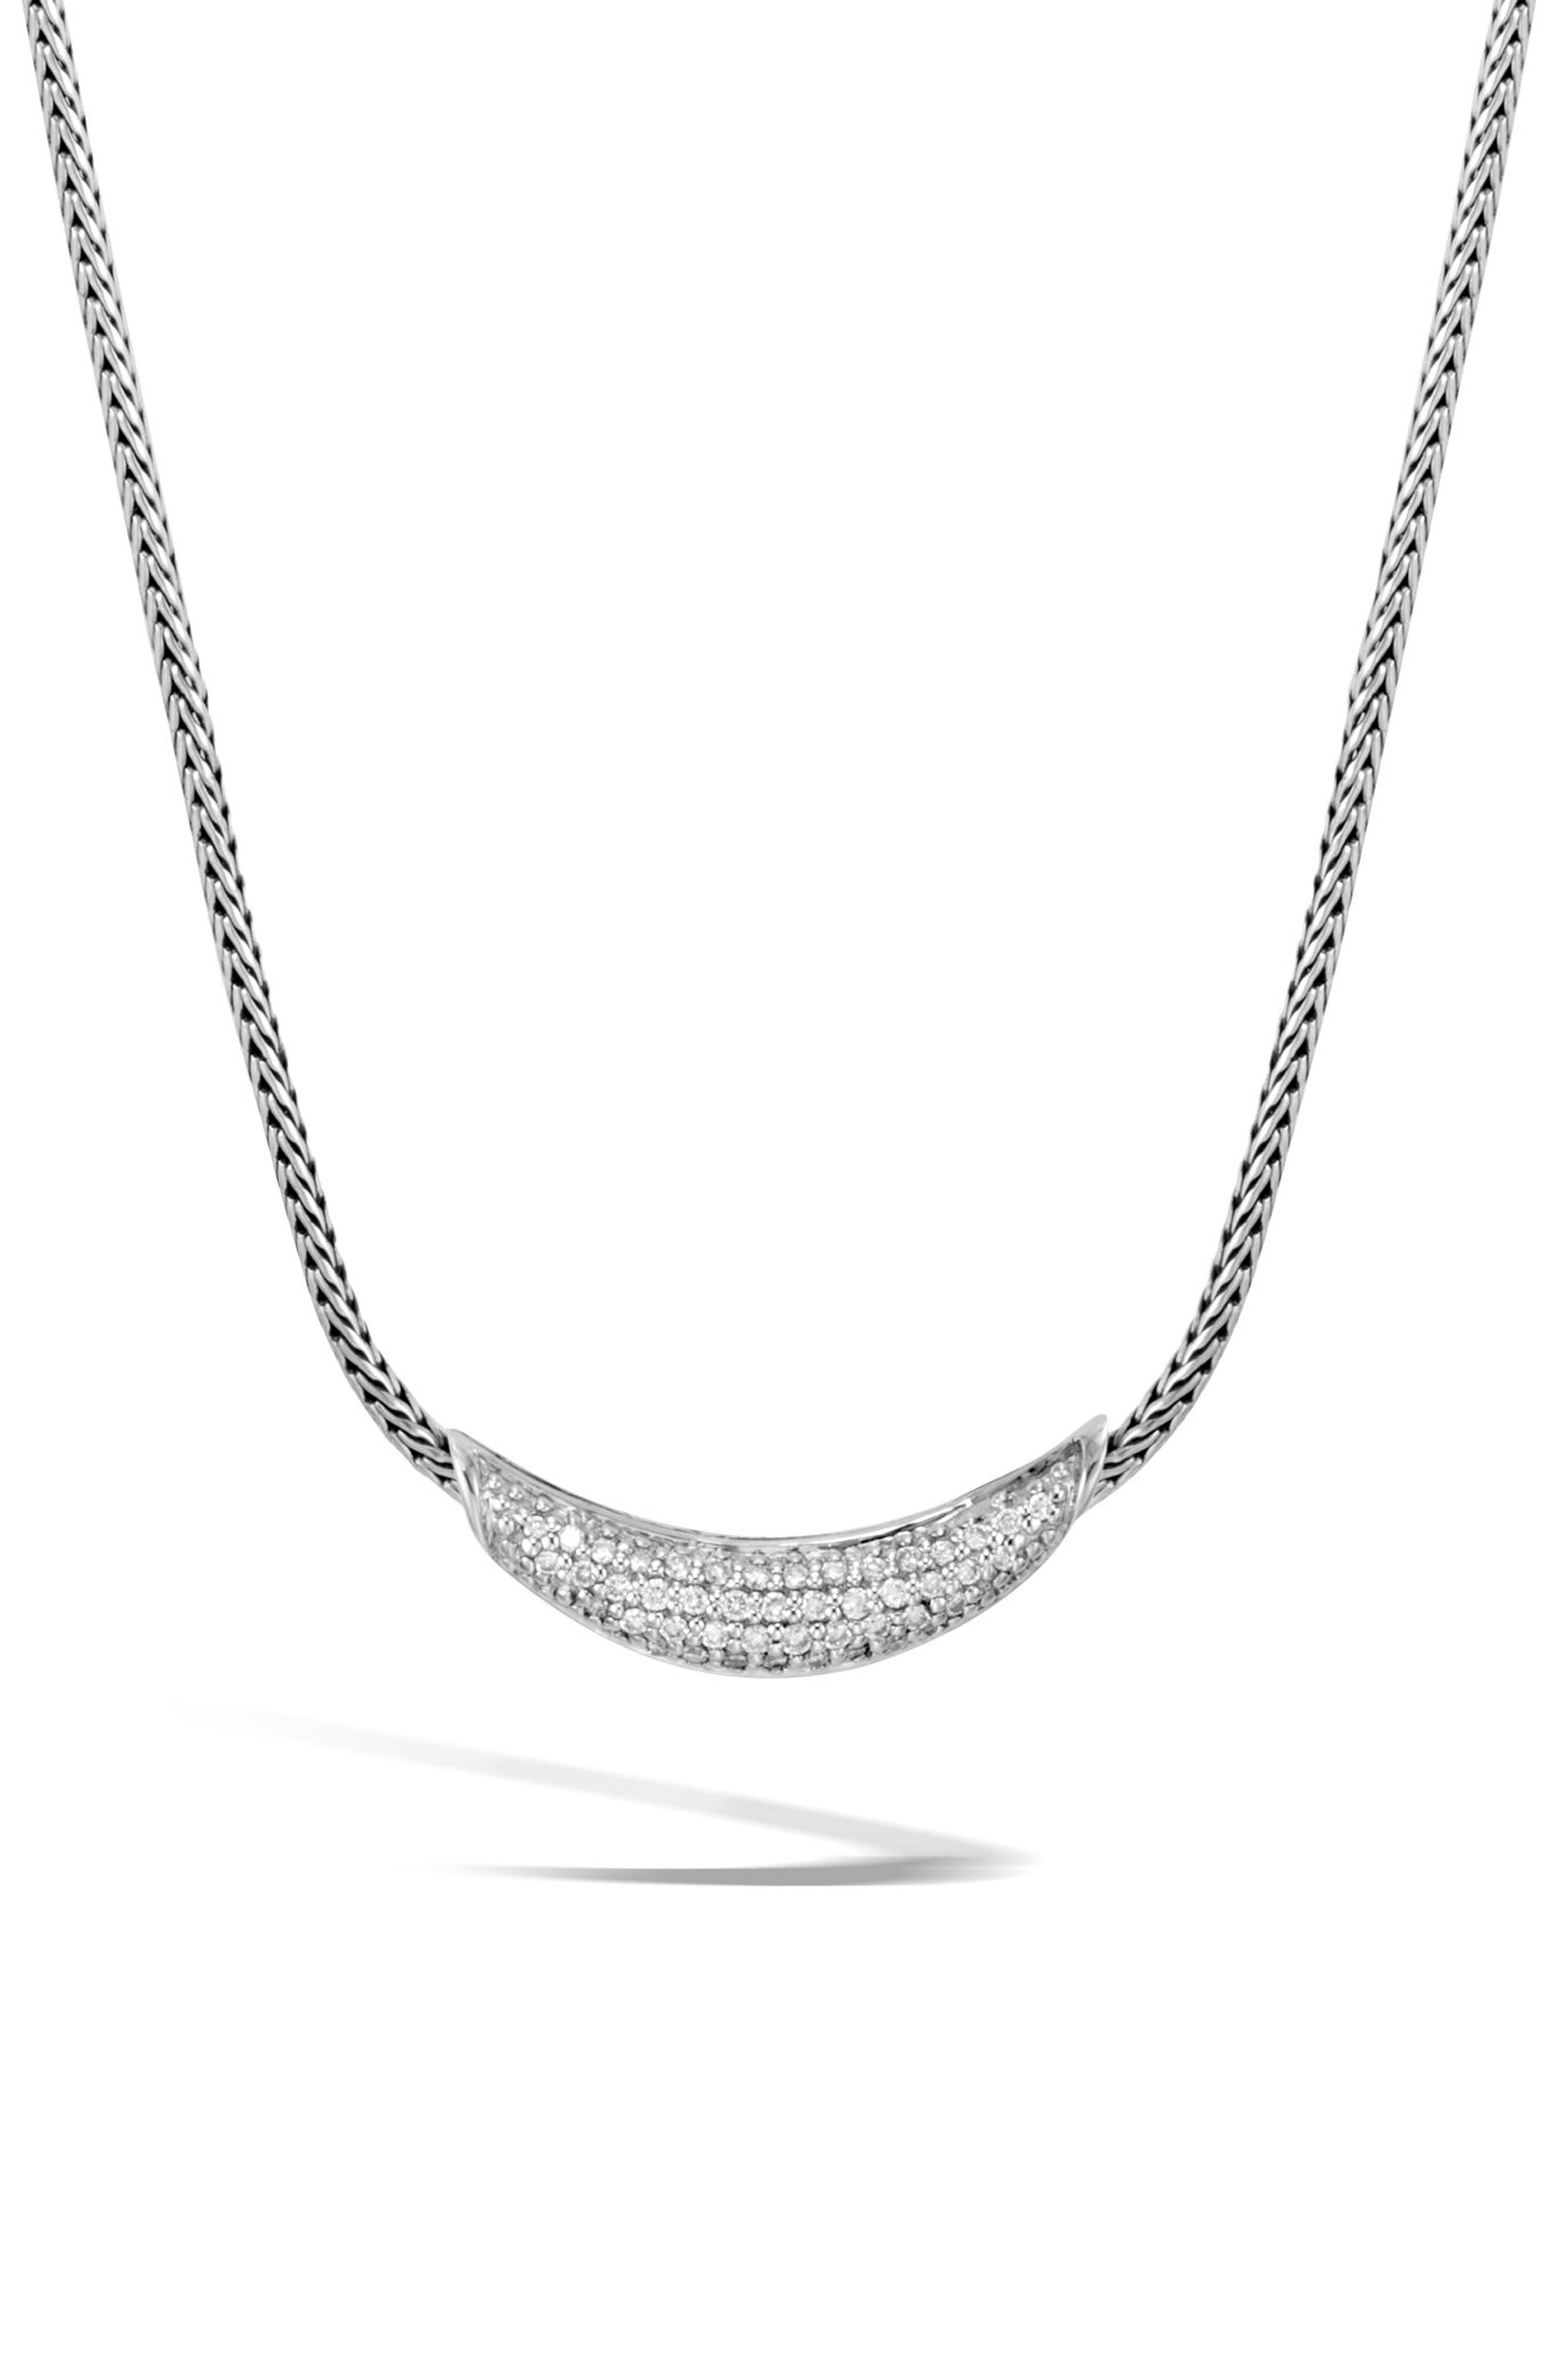 Classic Silver Chain Diamond Pavé Necklace,                             Main thumbnail 1, color,                             SILVER/ DIAMOND